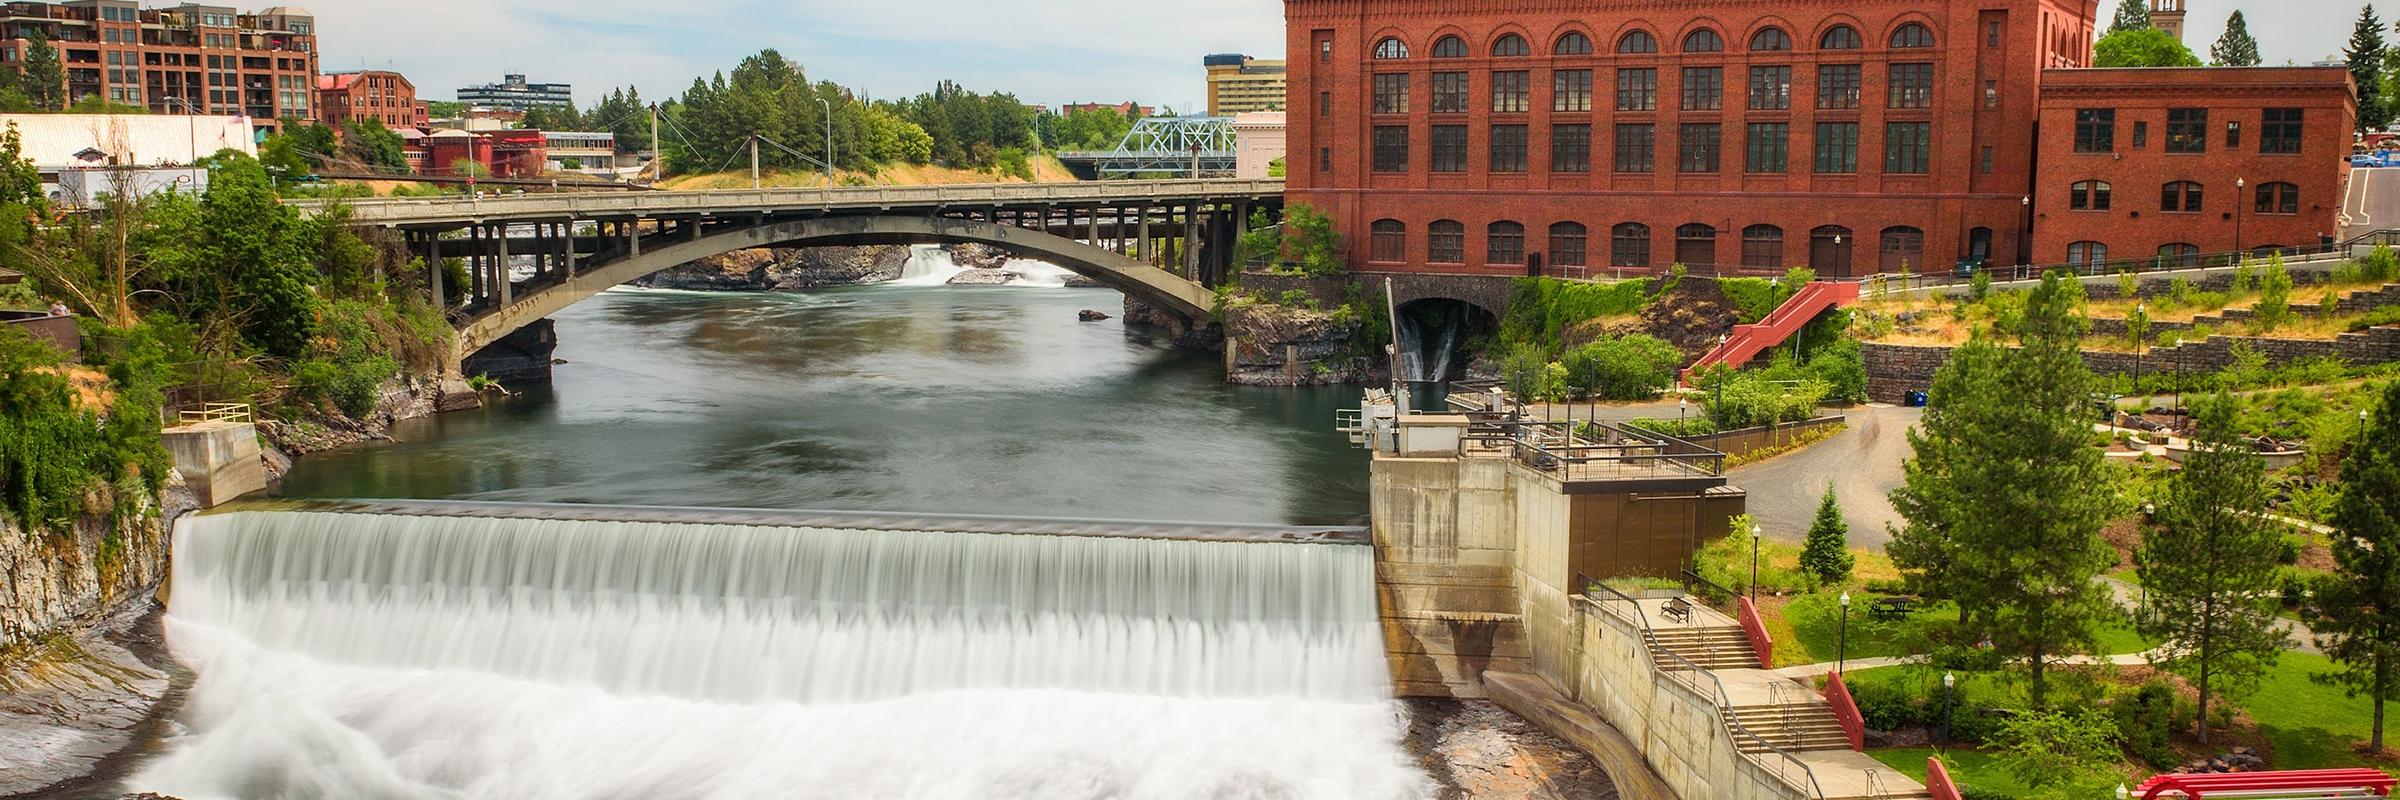 everyday-spokane-home-image-1